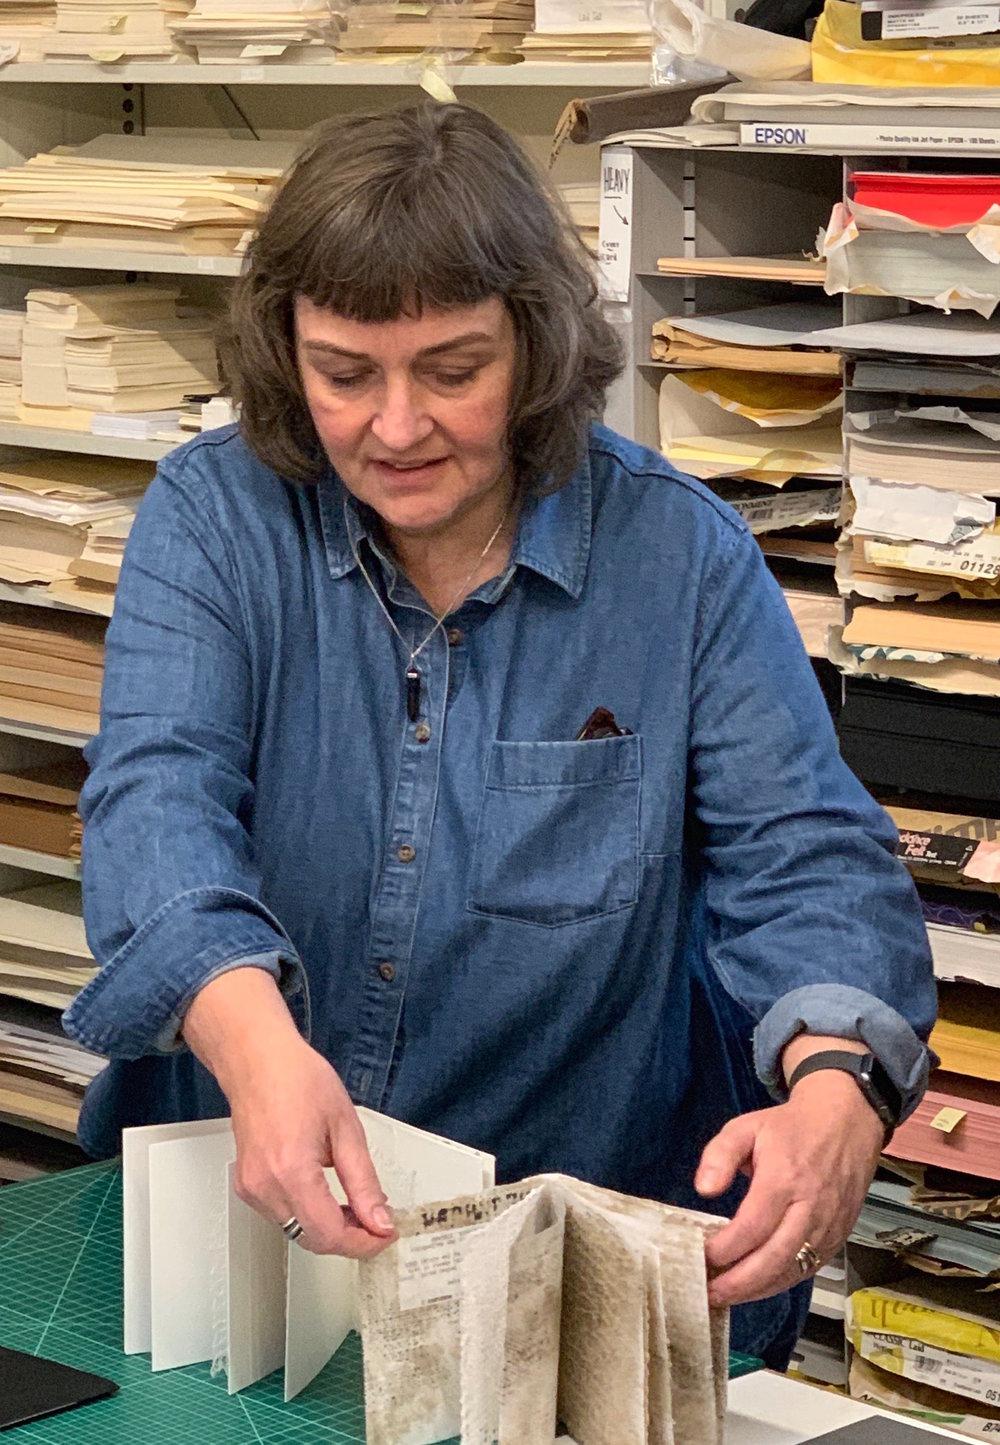 Arnprudur Osp Karlsdottir (Iceland) showing her artist book